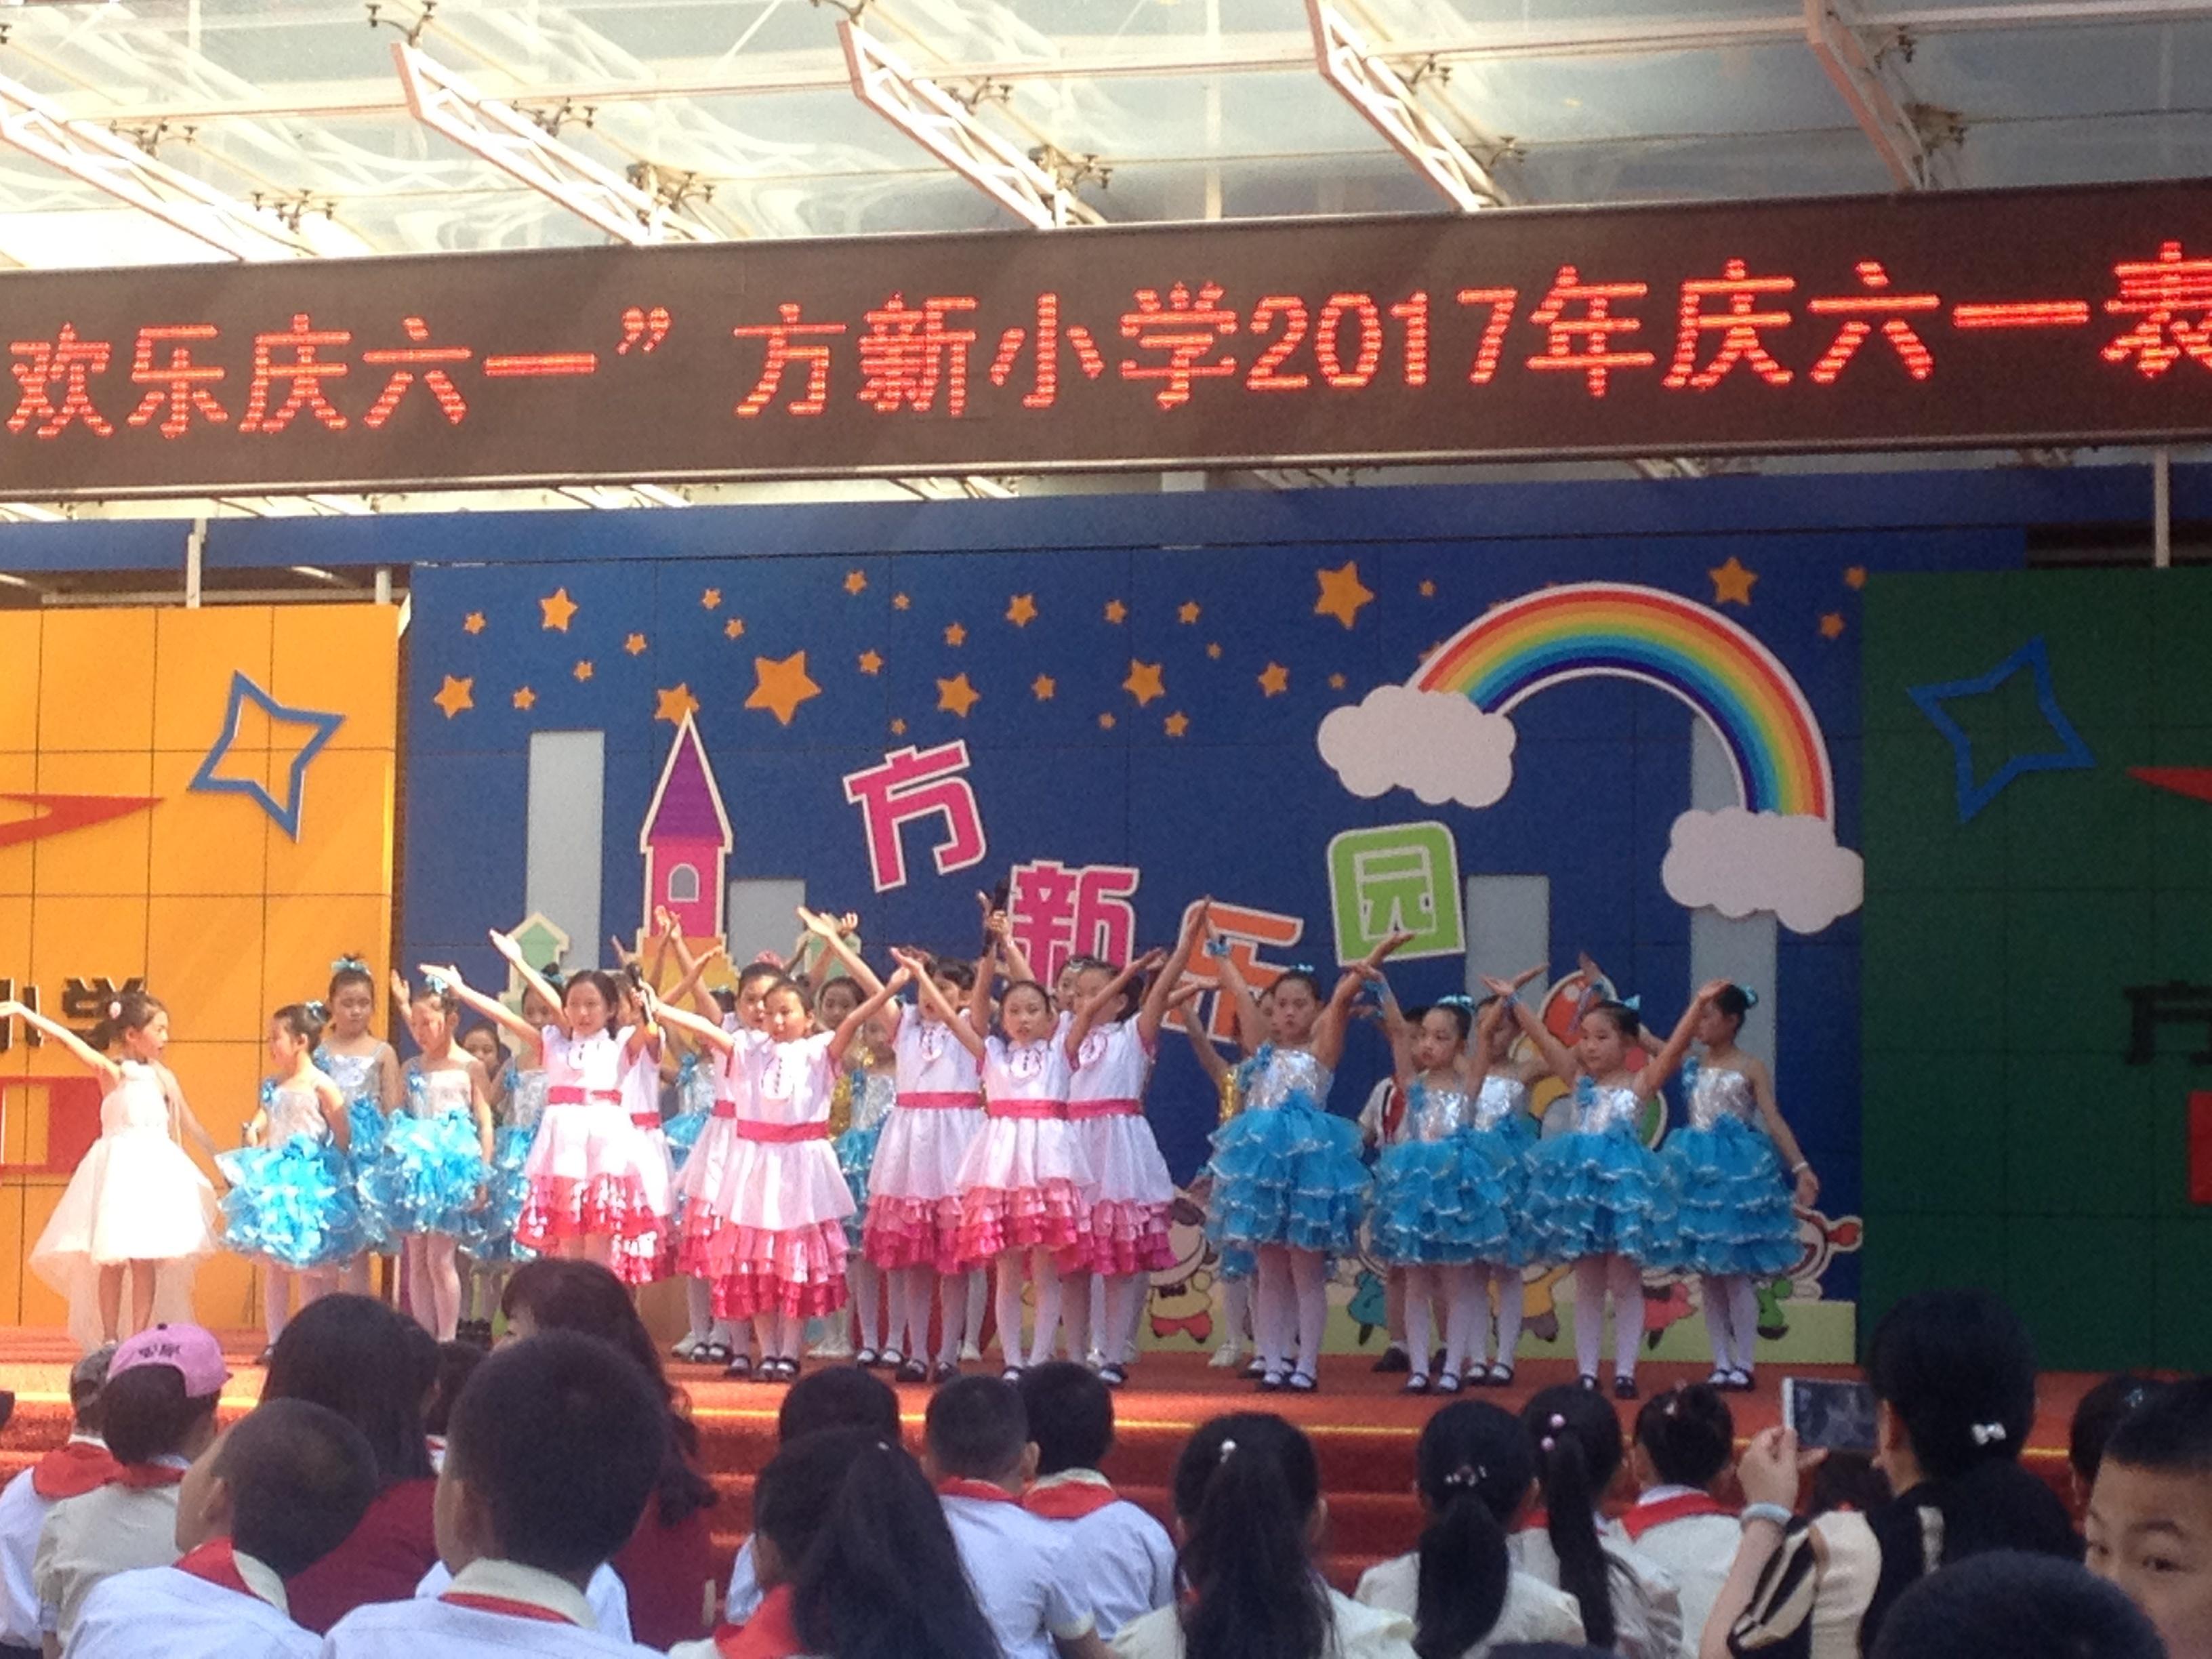 childrens_day_performances.jpg